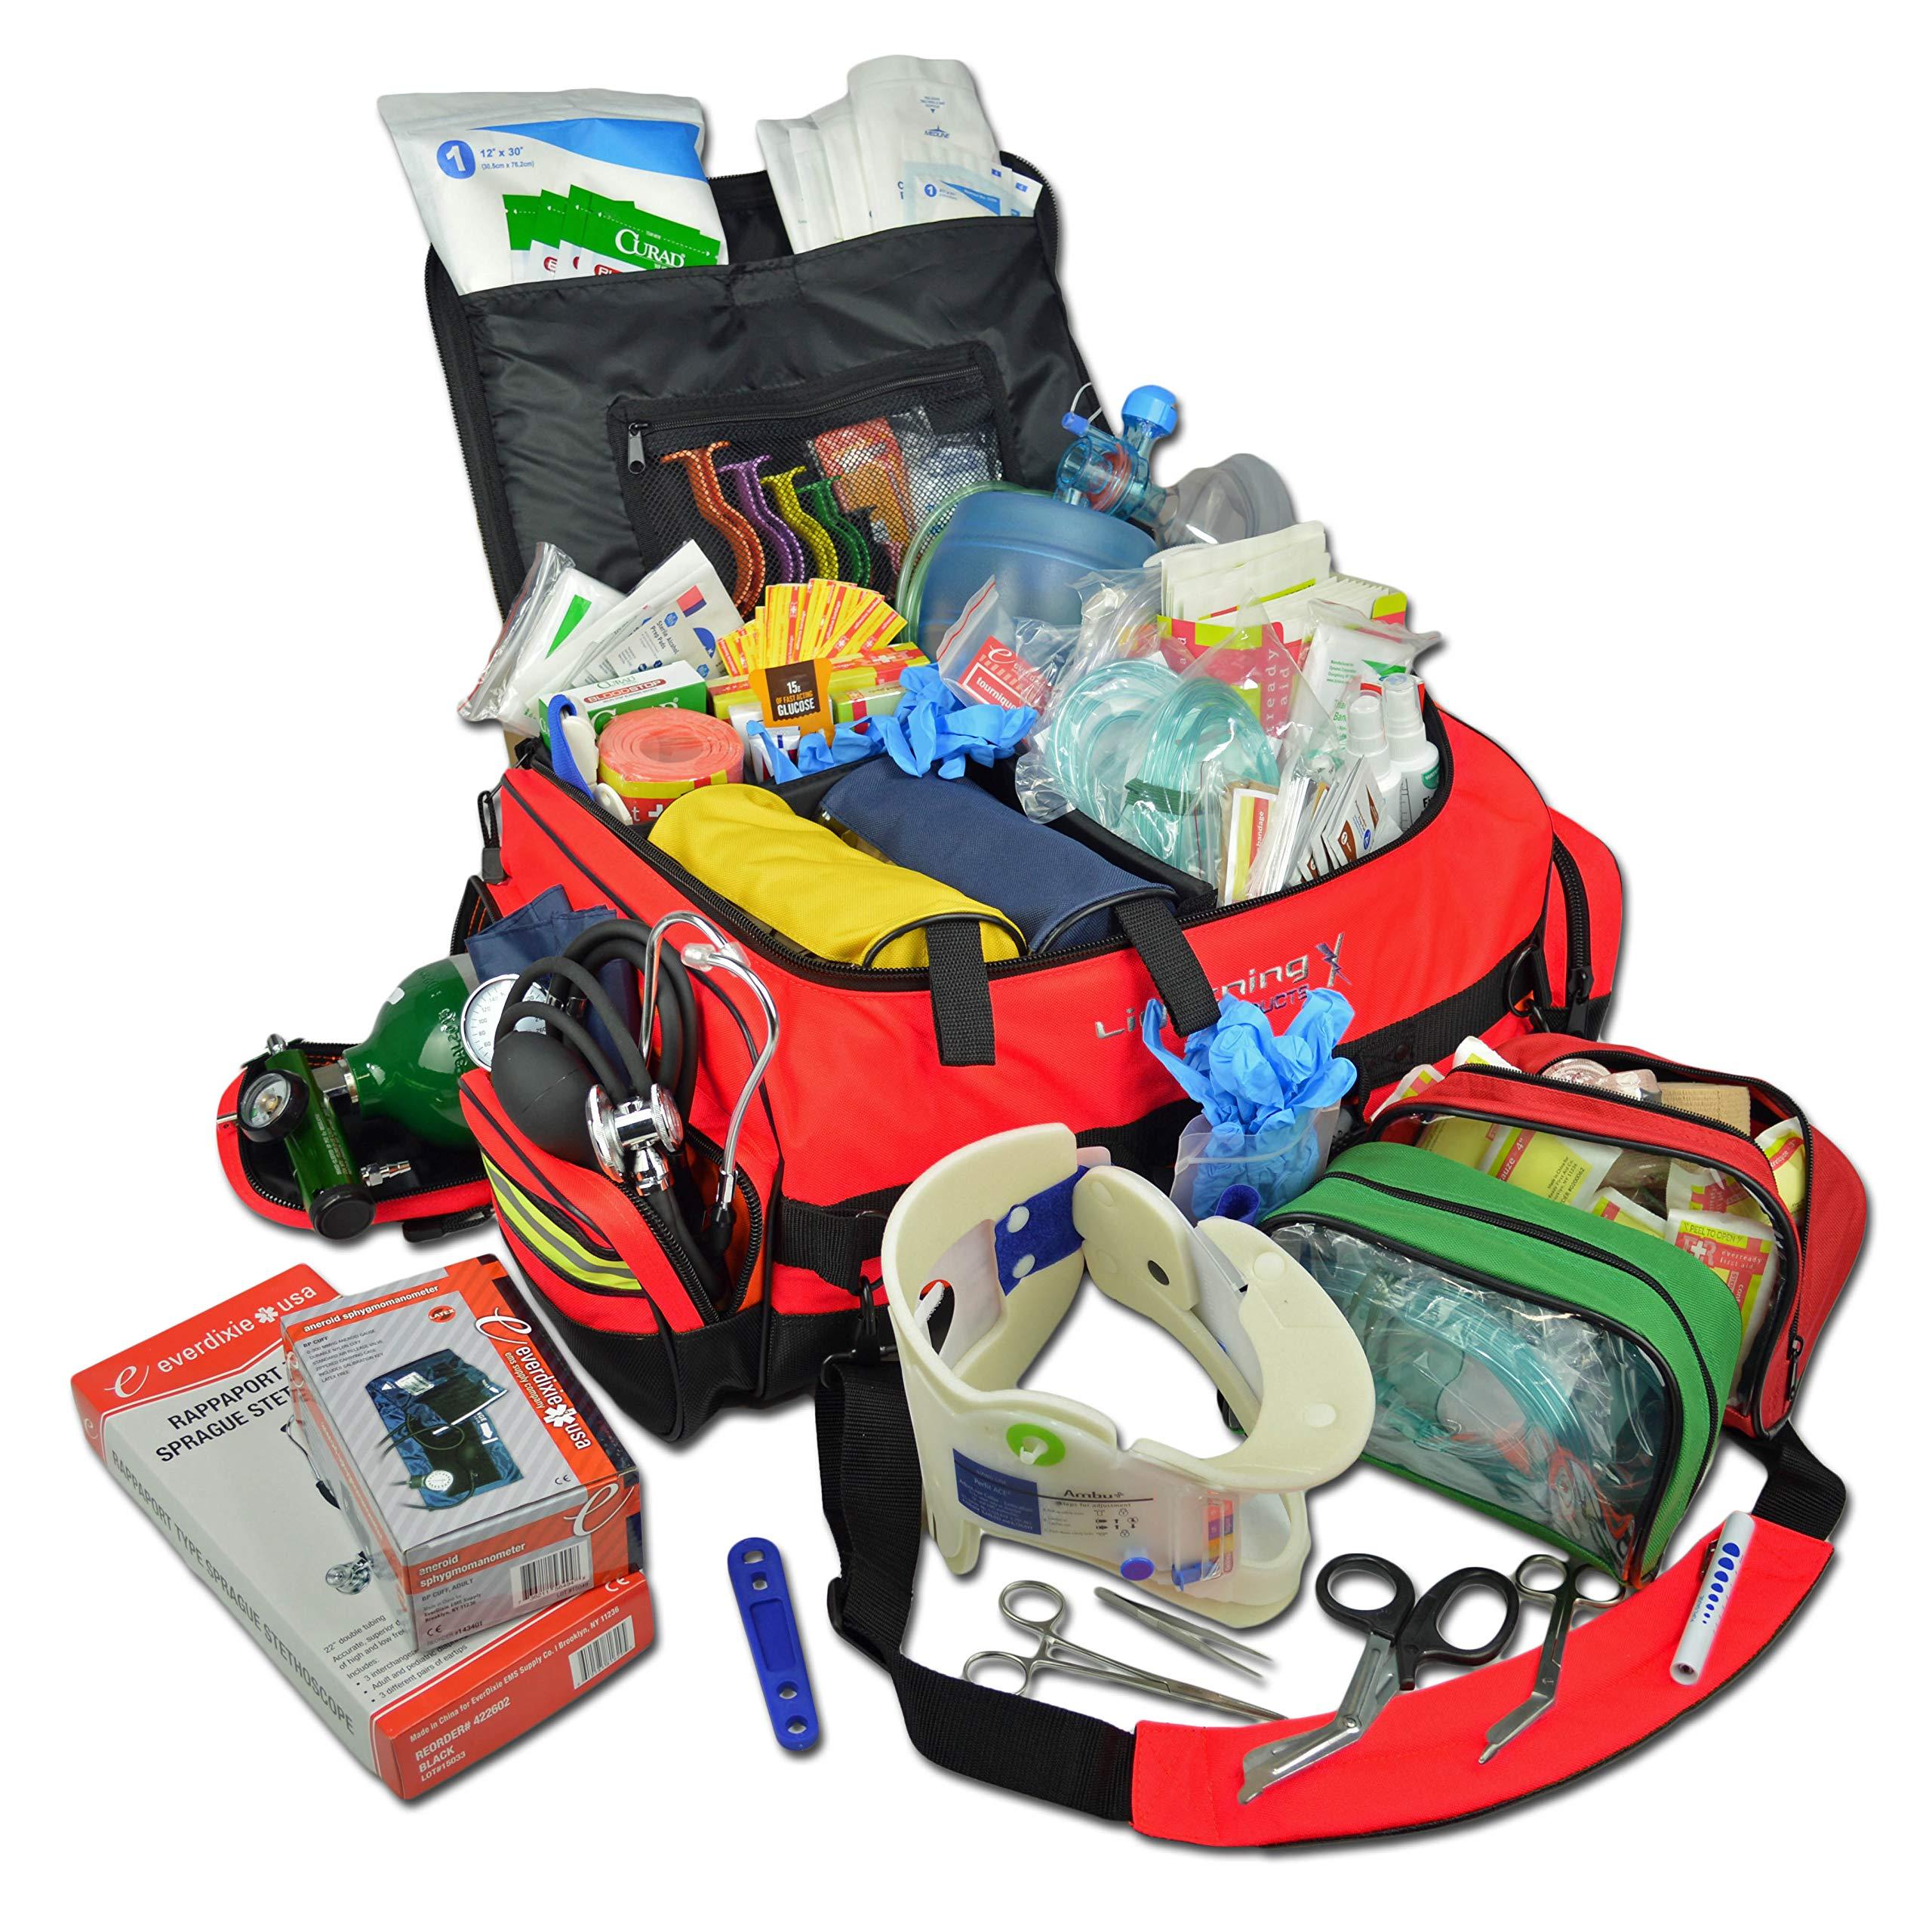 Lightning X Jumbo Medic First Responder EMT Trauma Bag Stocked First Aid Trauma Fill Kit D